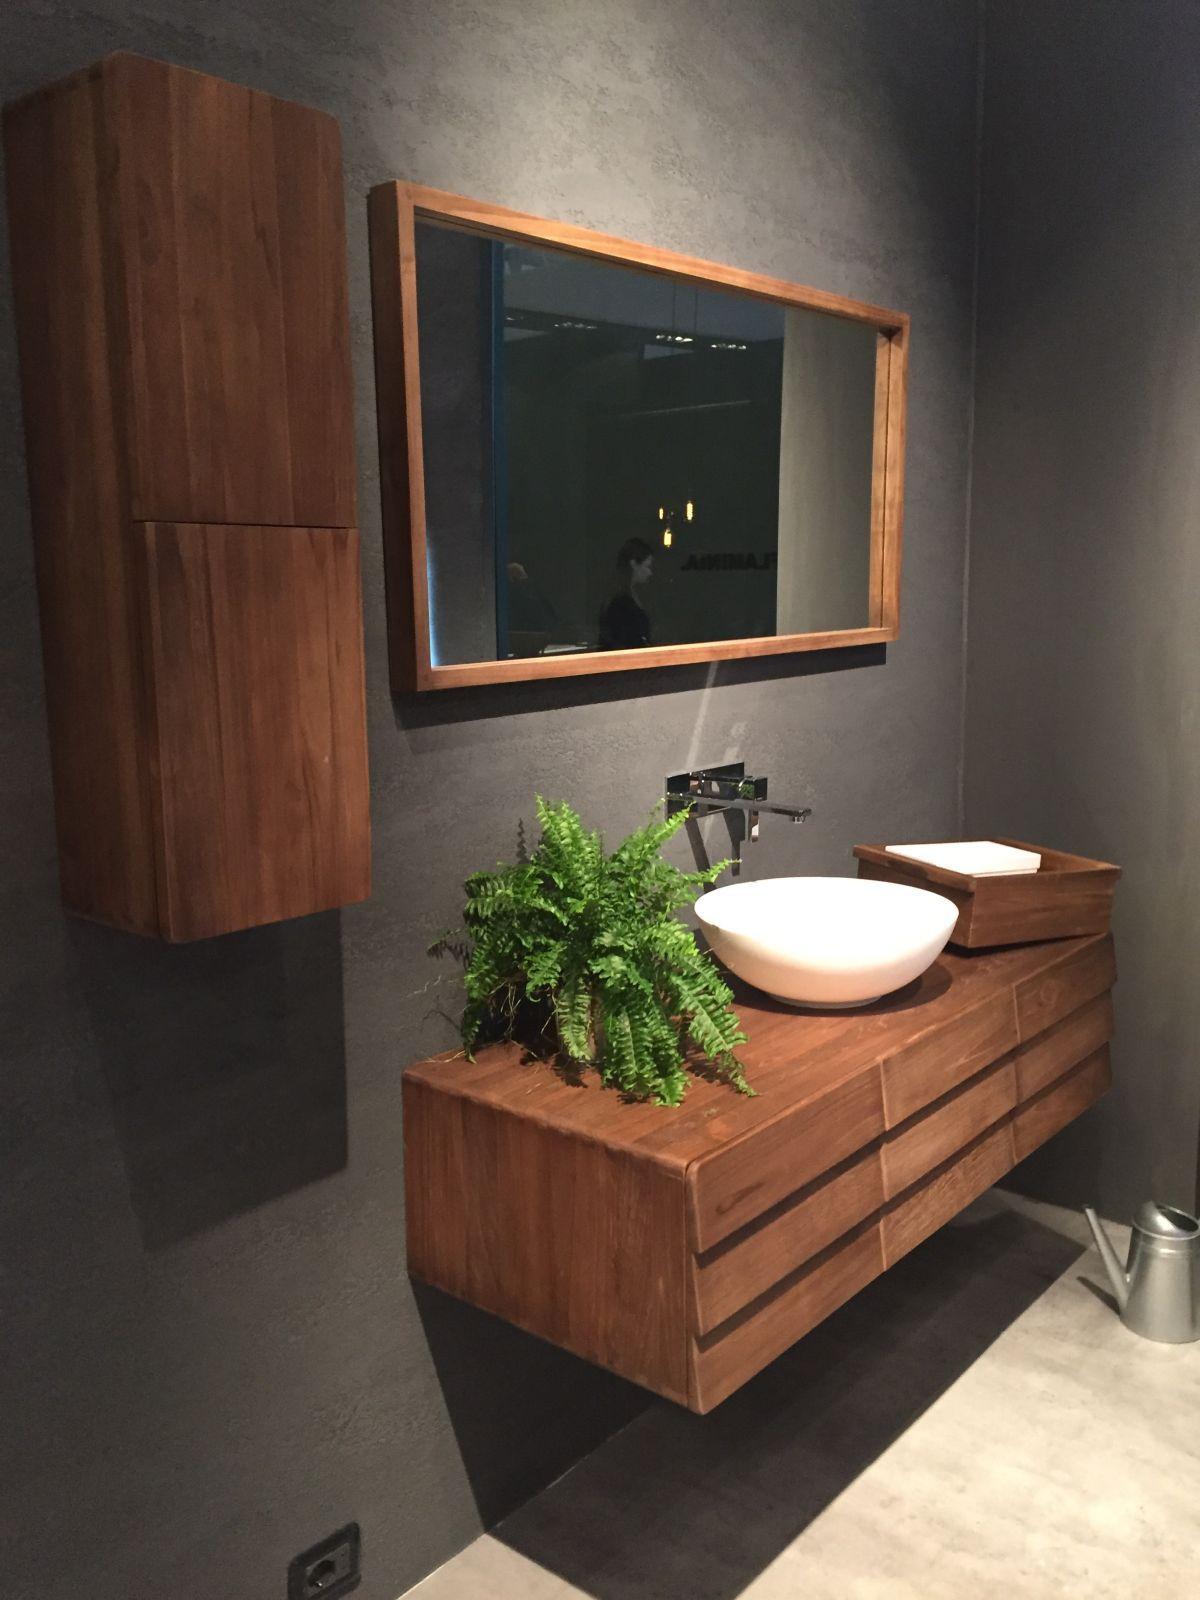 Stylish ways to decorate with modern bathroom vanities pinterest